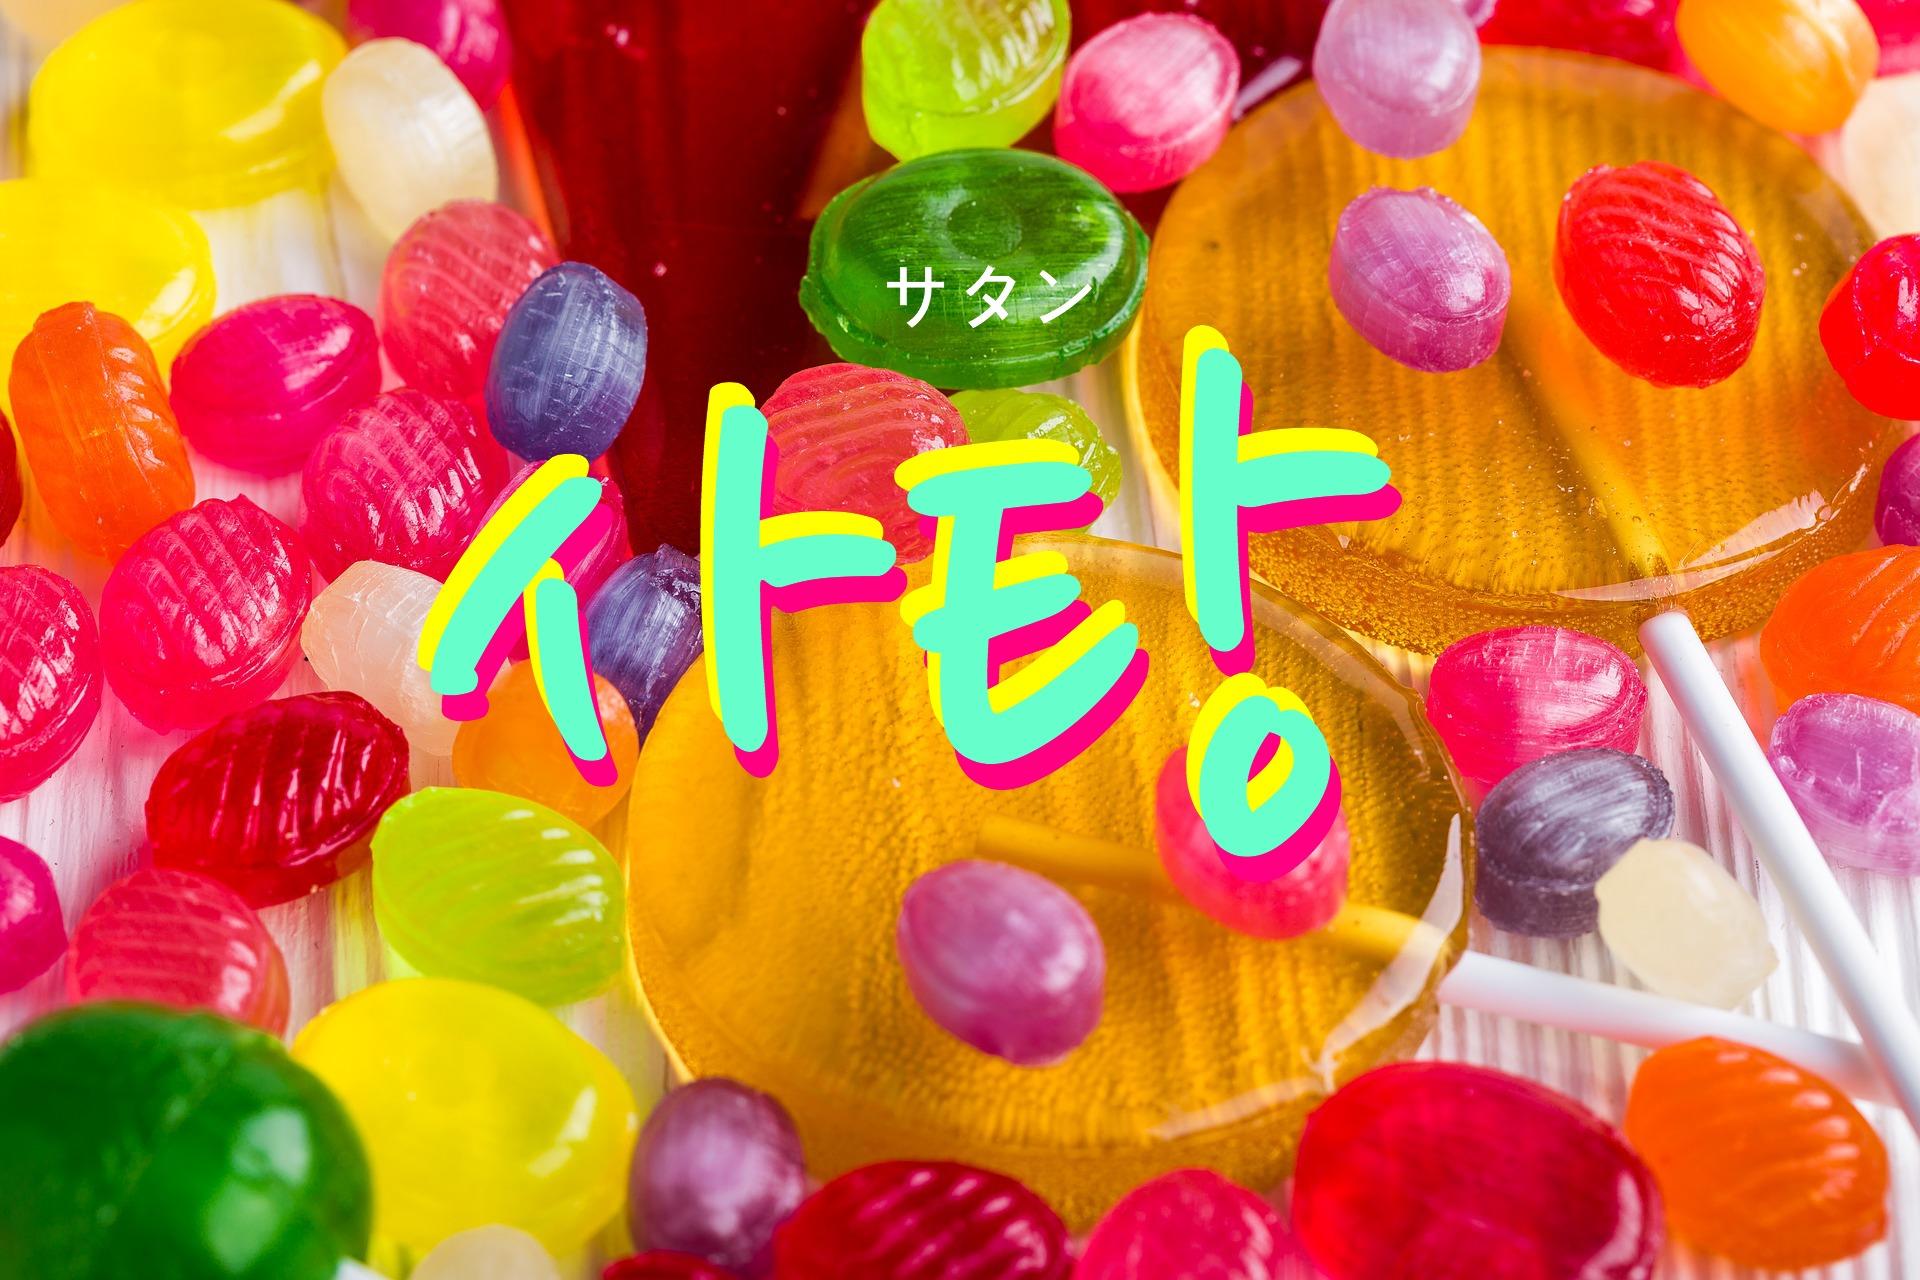 koreanword-candy